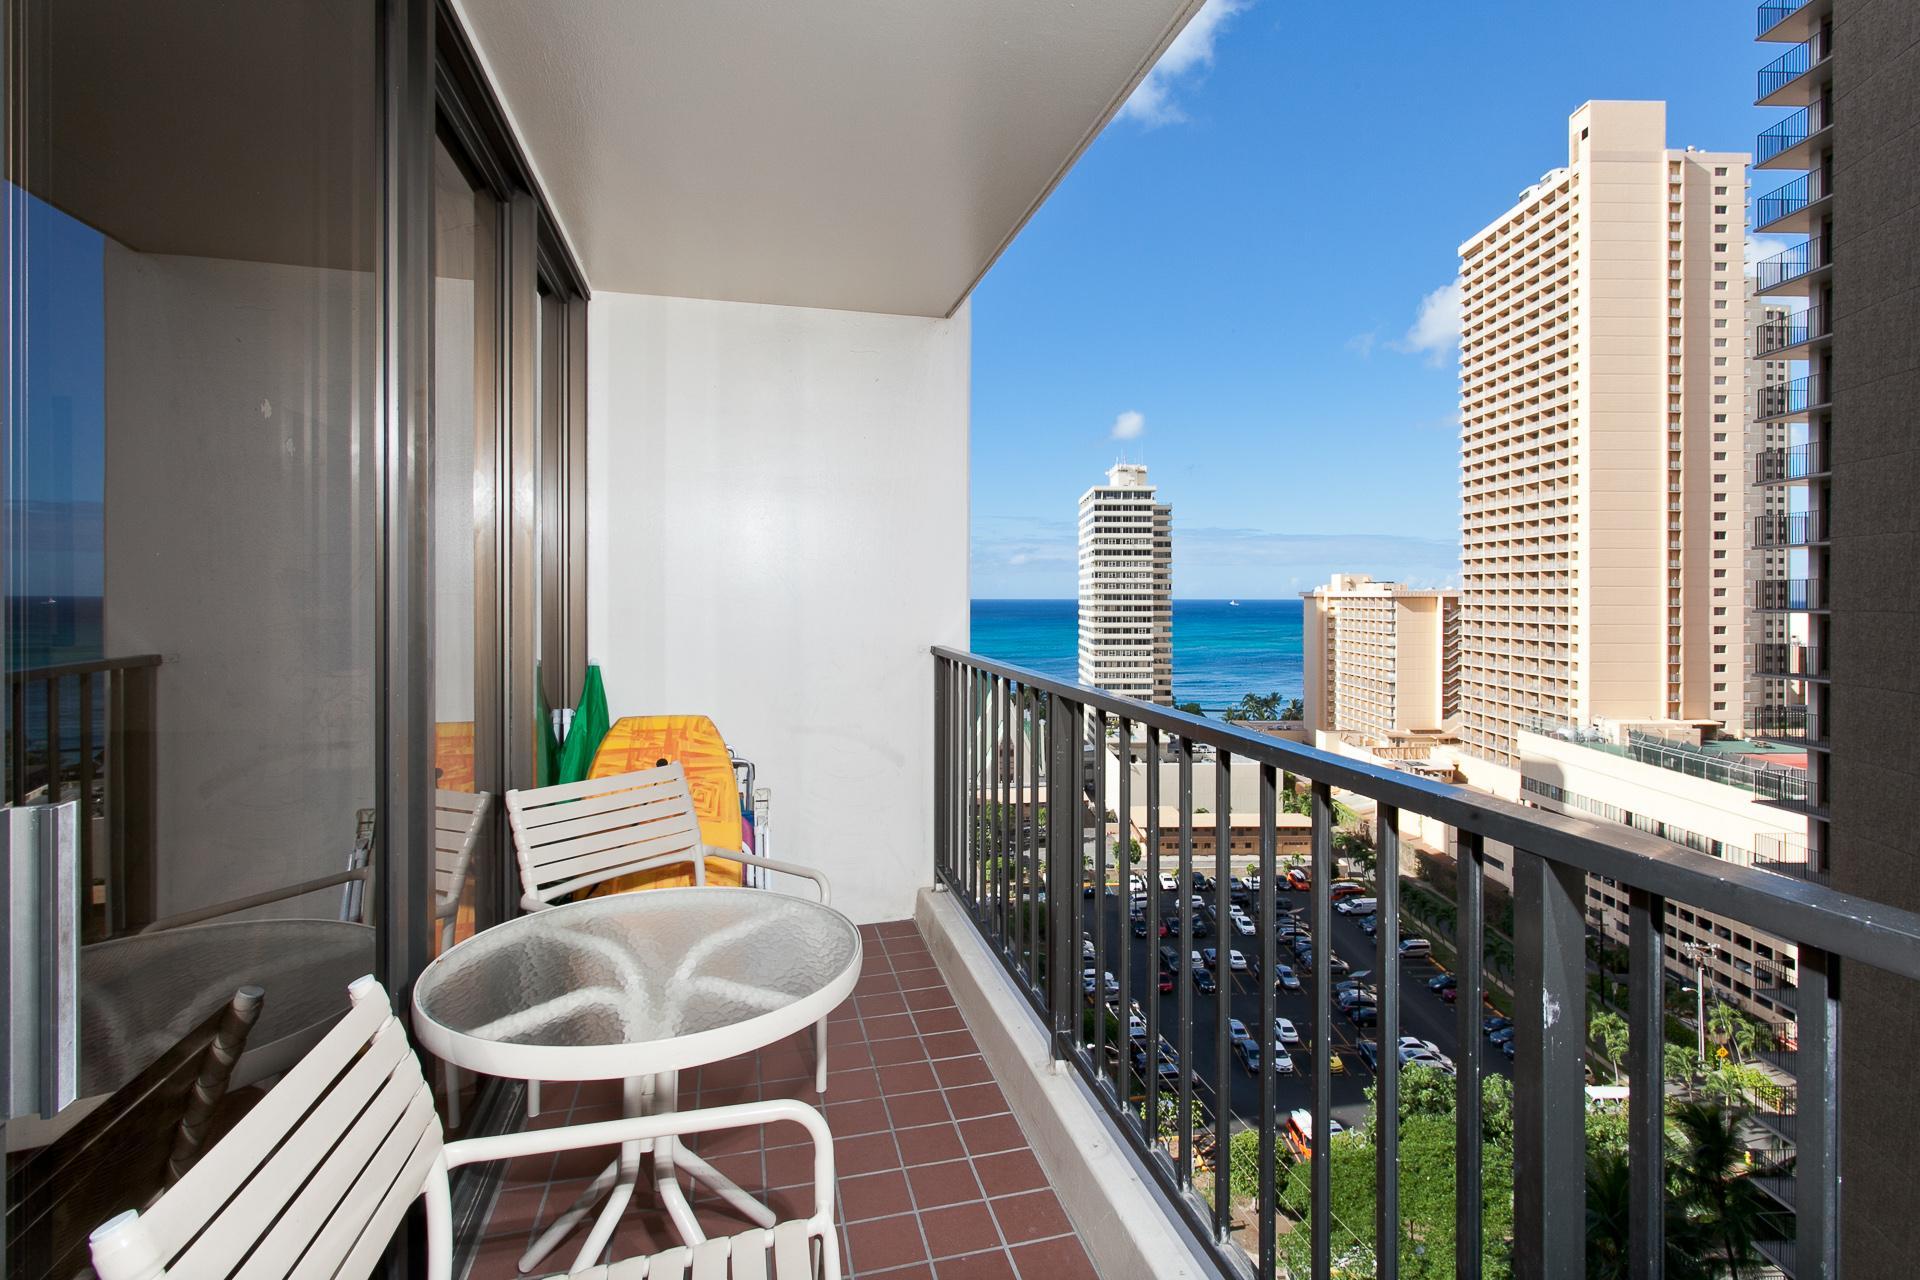 Honolulu, Hawaii Vacation Rental | Waikiki Banyan 1806 T1 | 1 ...